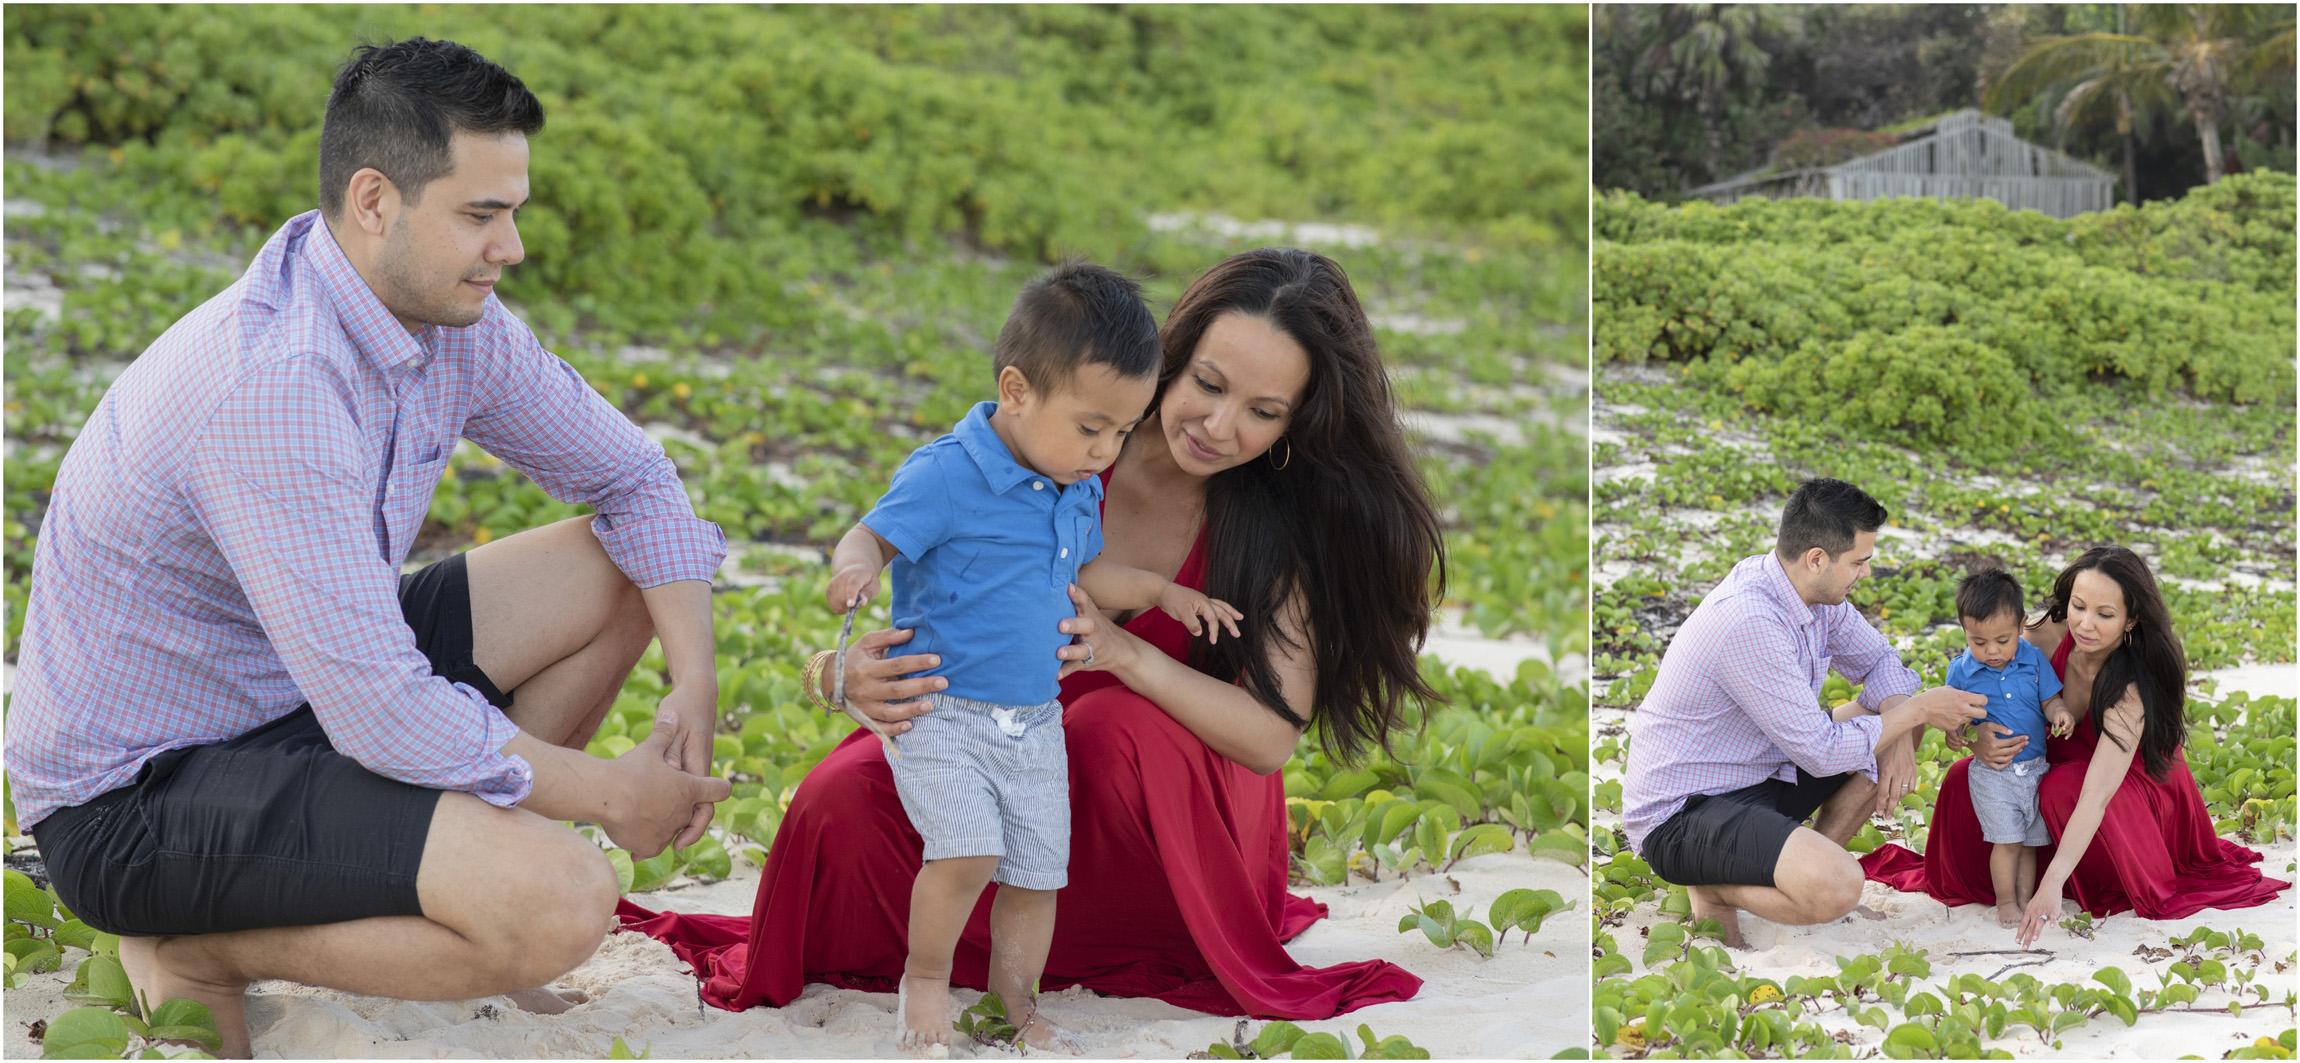 ©FianderFoto_Bermuda Maternity Photographer_Kat_John_J_003.jpg